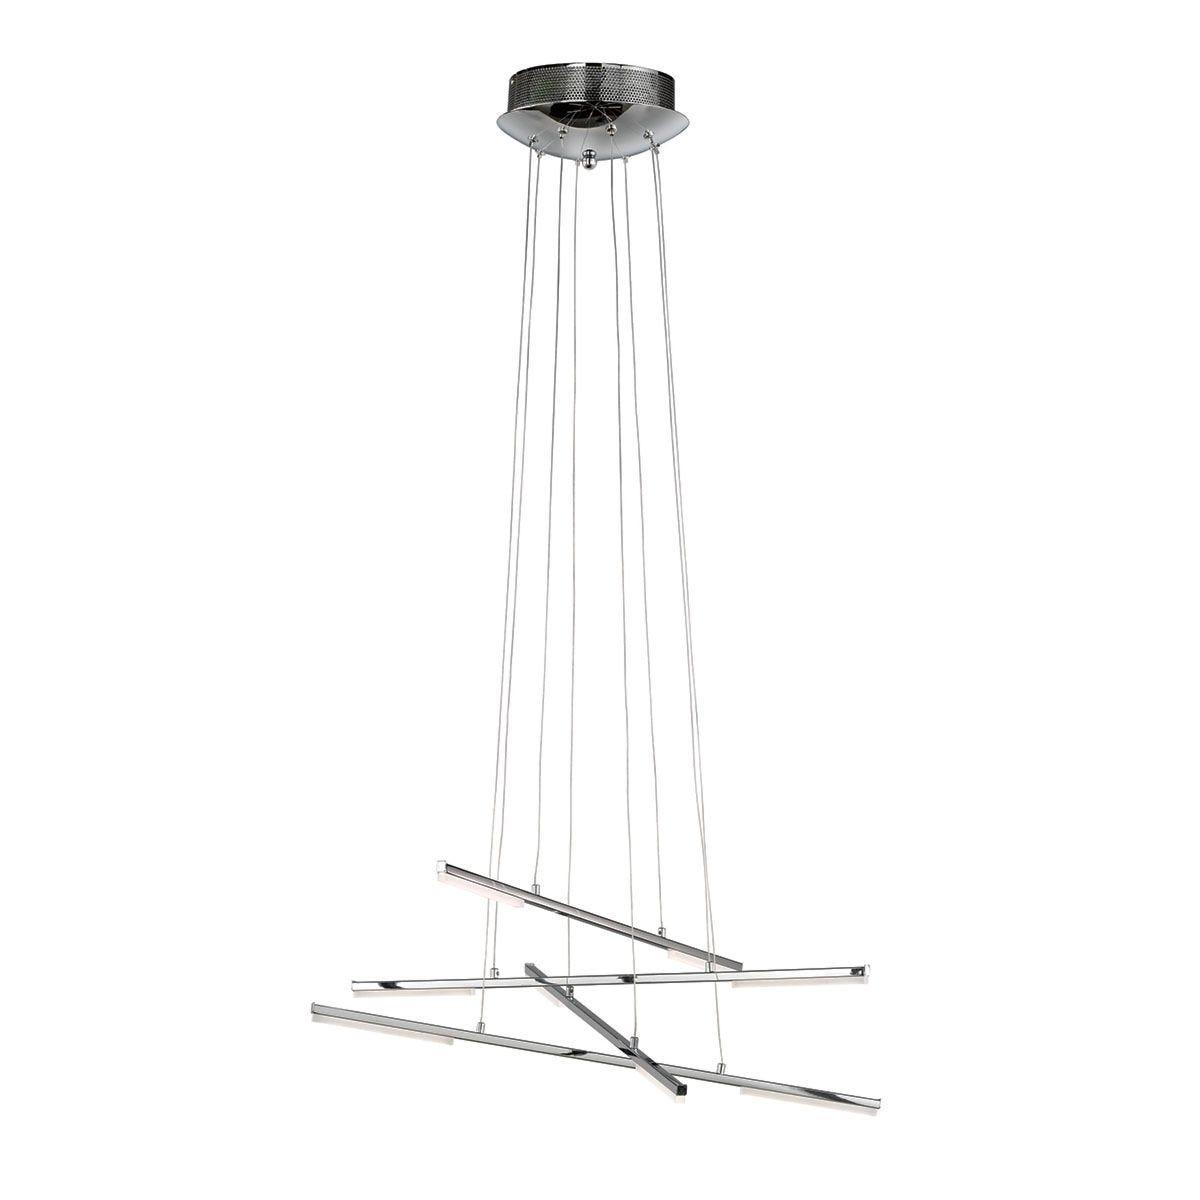 Wofi Forte 8-LED Pendant Lamp - Chrome